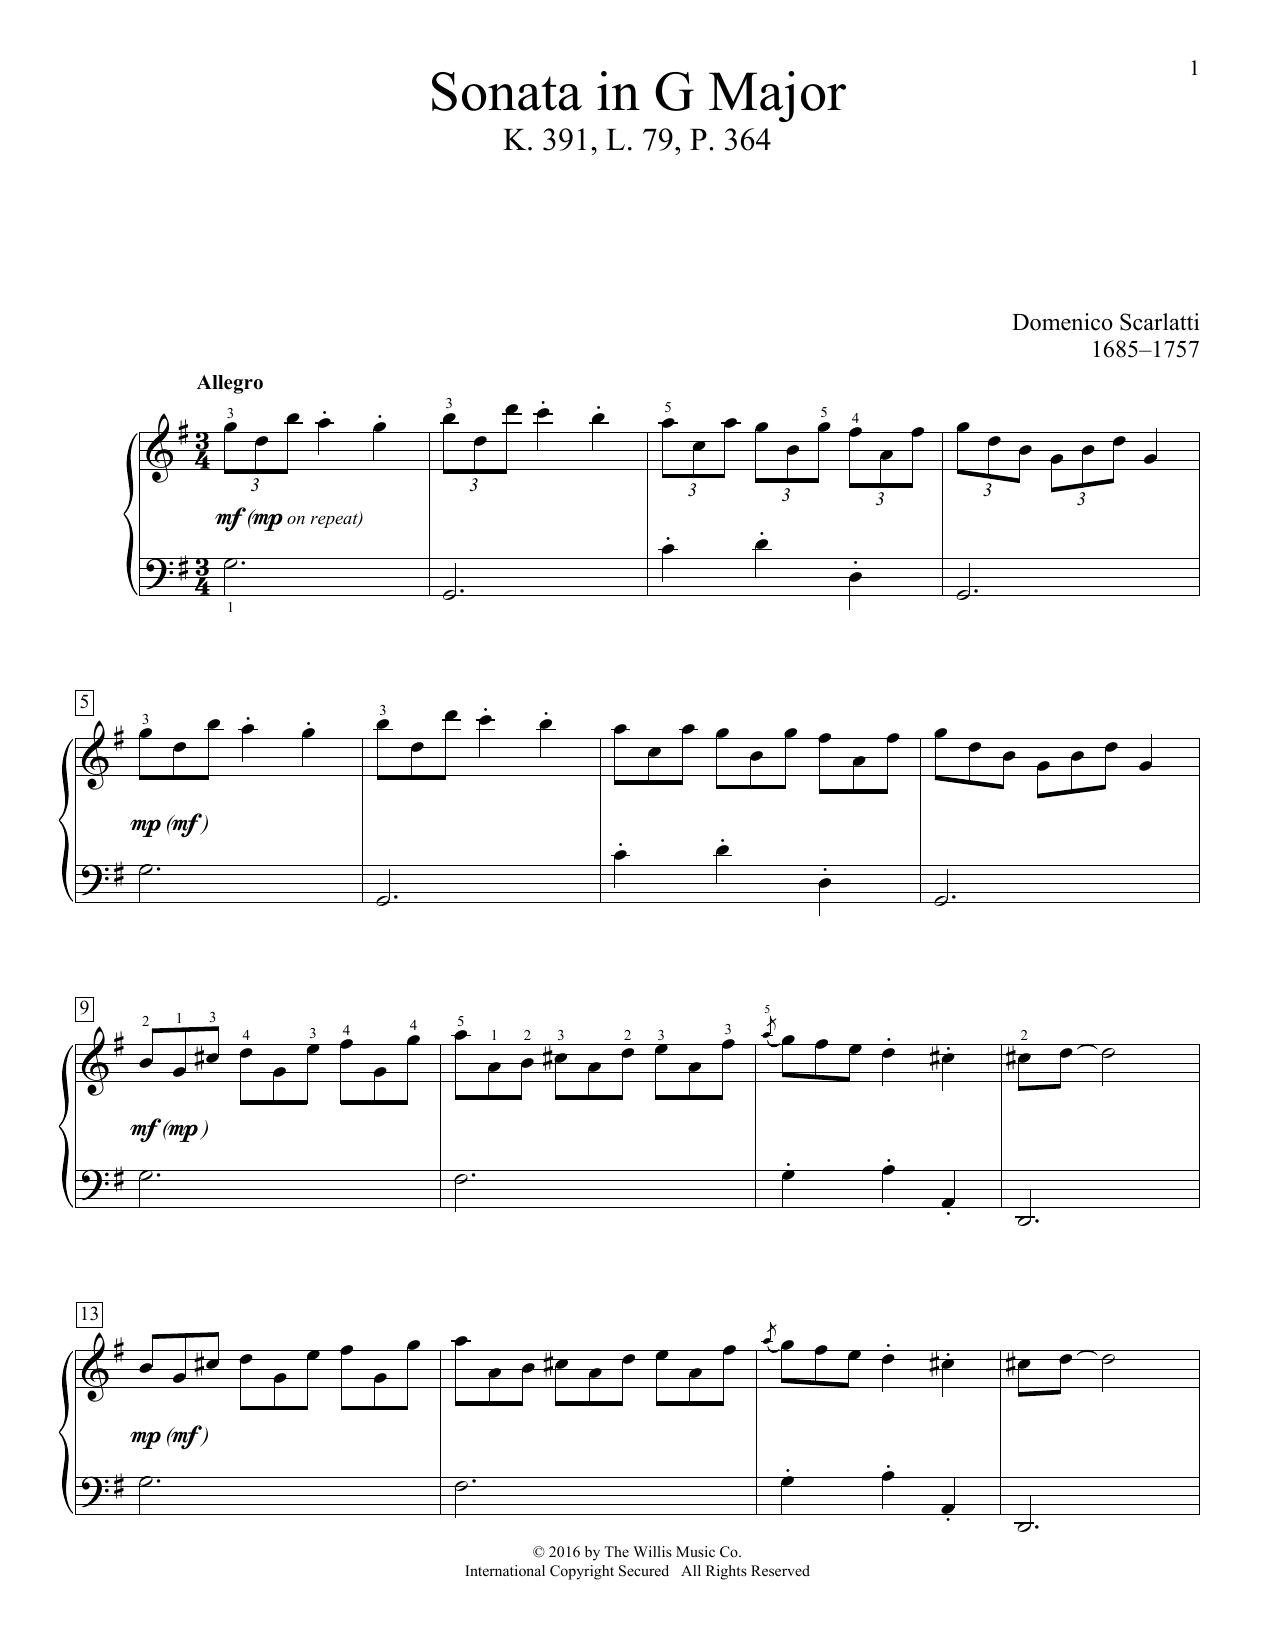 Sonata In G Major, K. 391, L. 79, P. 364 Sheet Music